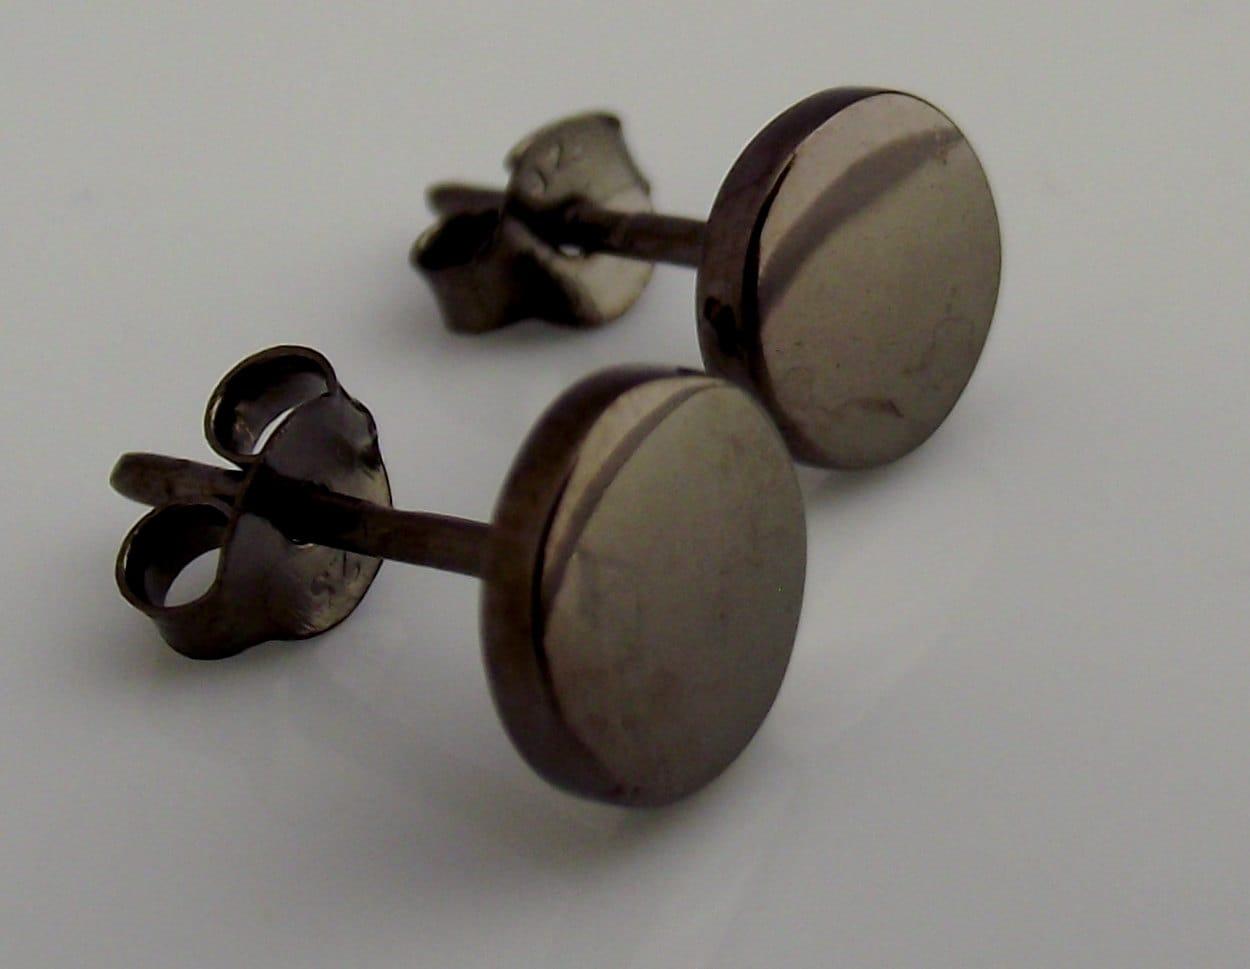 Mens Earrings Black Stud Earrings for Men Nail It Down